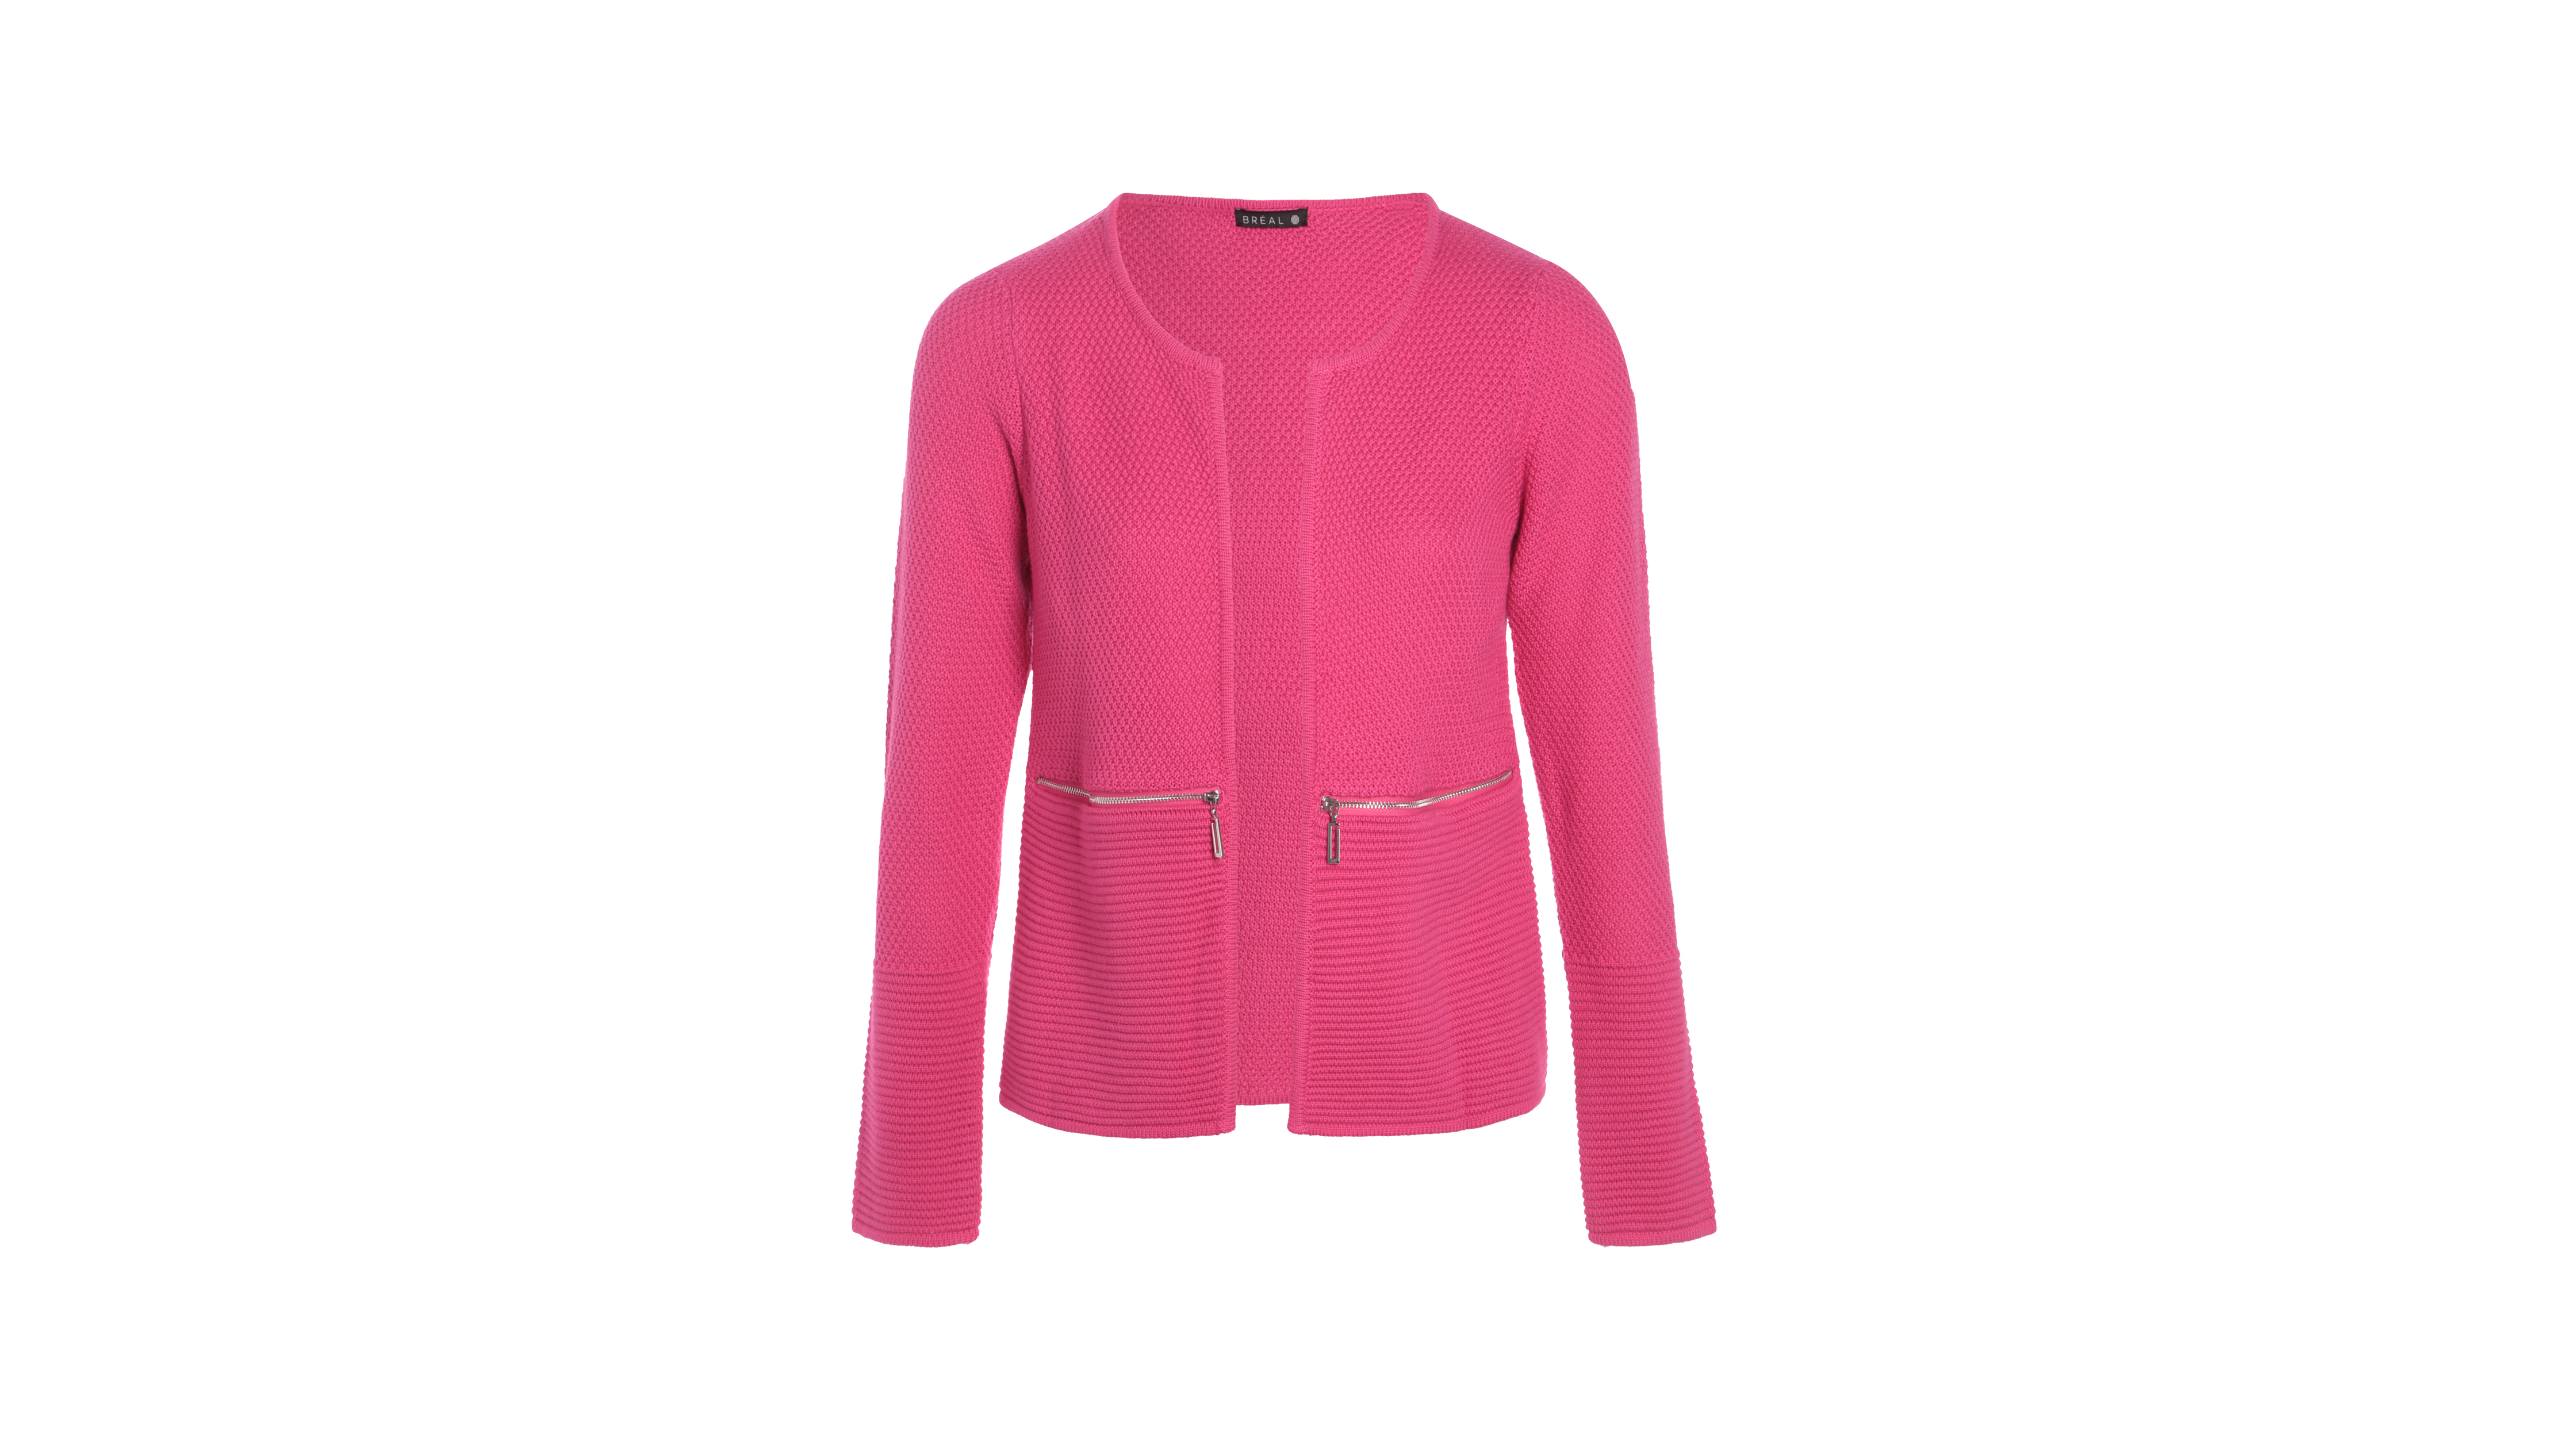 grand choix de 15396 7944f Gilet avec zips rose fushia femme